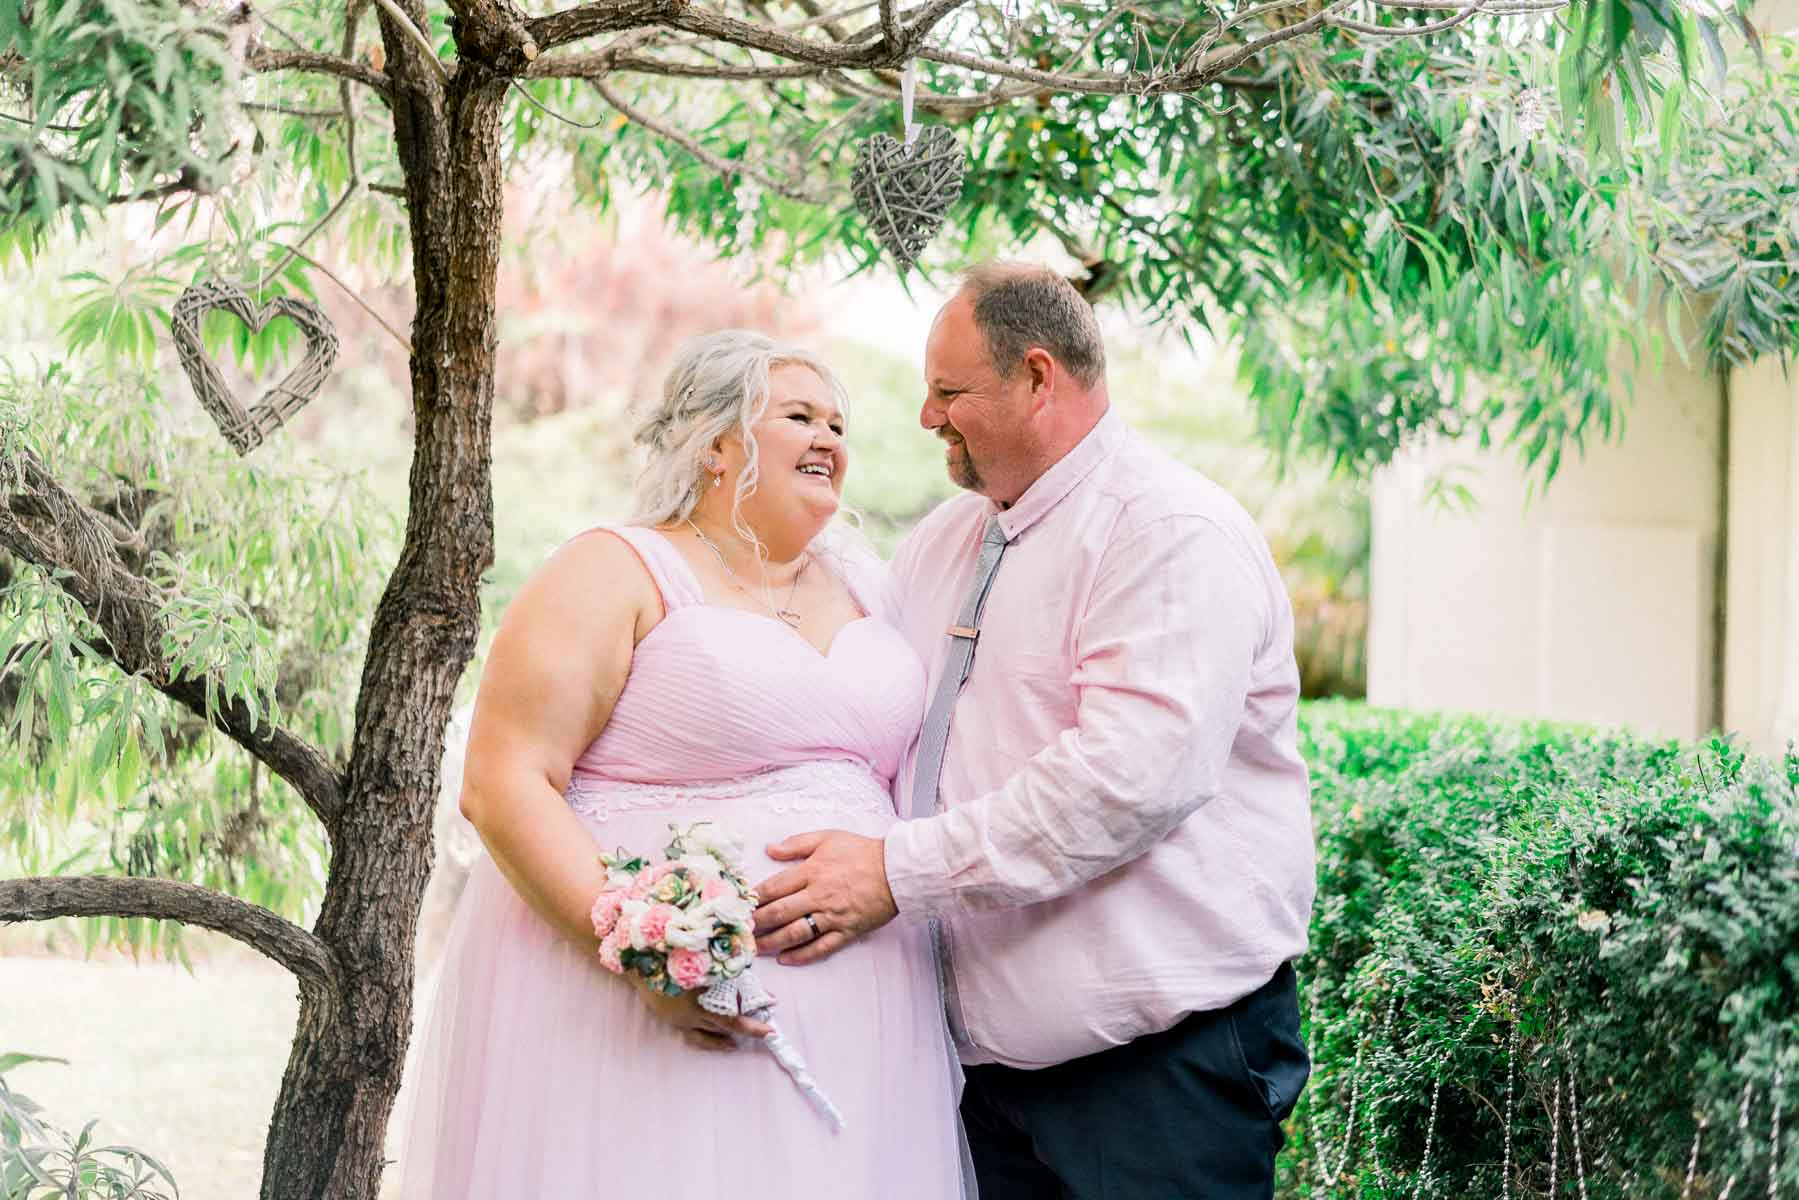 mt-eliza-mornington-peninsula-backyard-wedding-heart+soul-weddings-allison-matt-04041.jpg